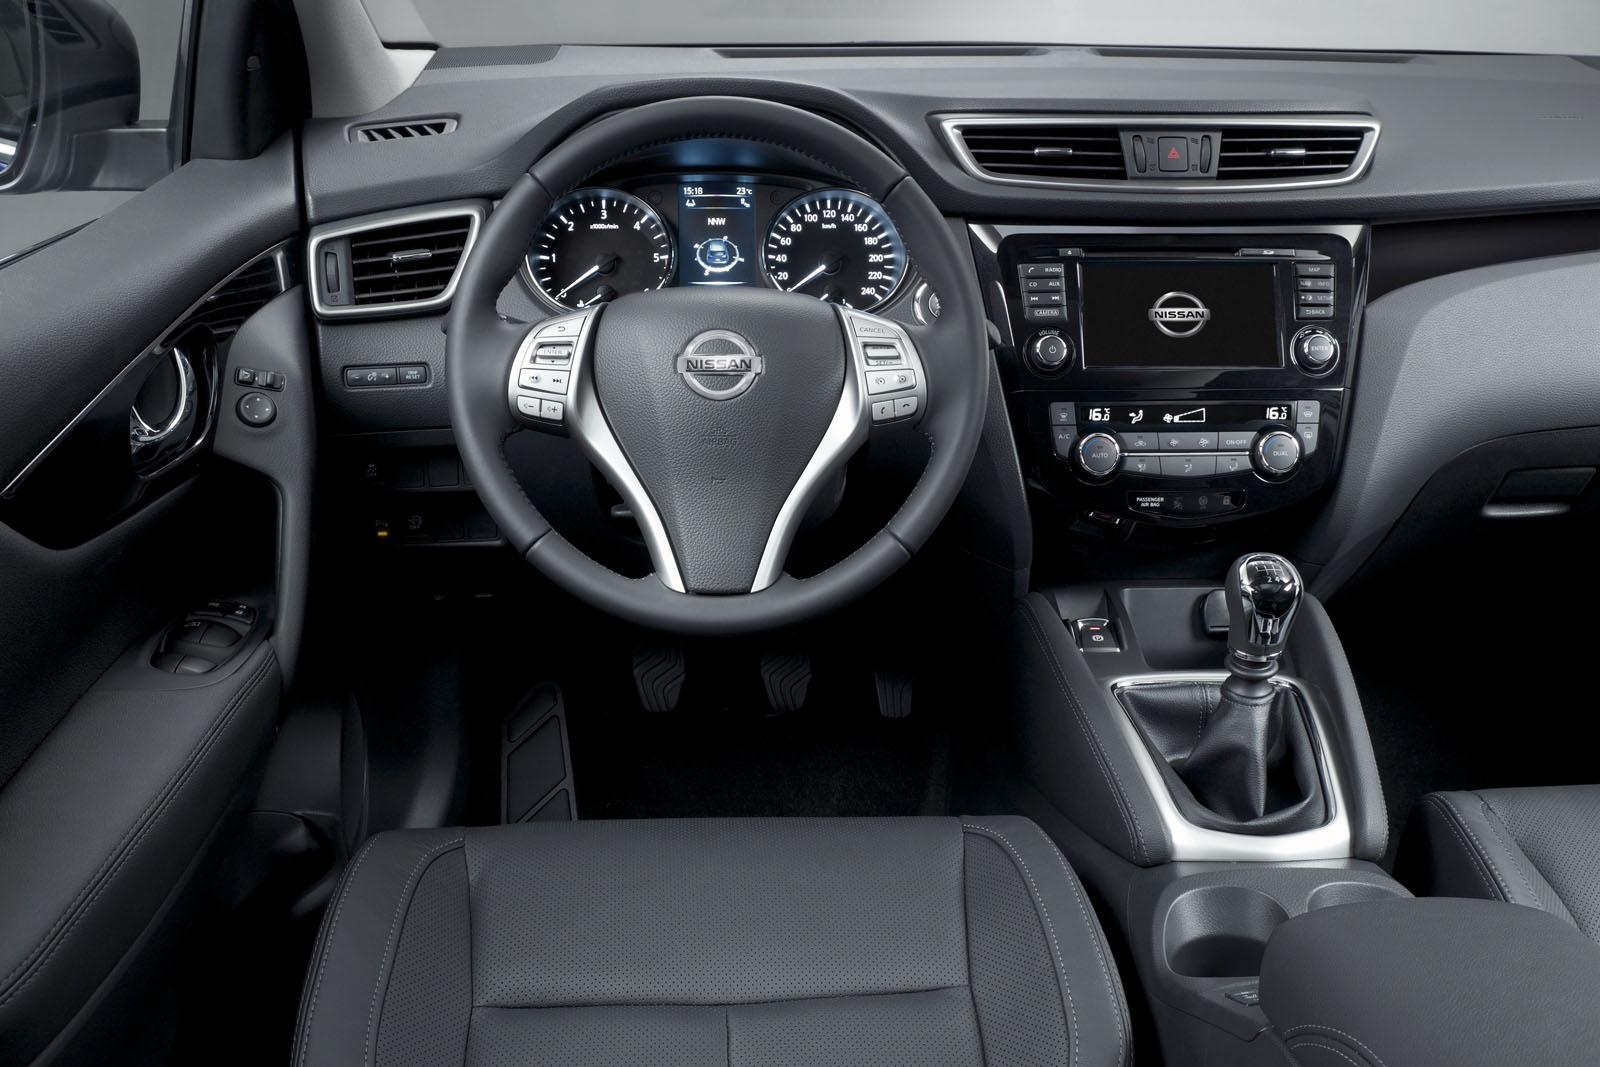 Nissan Cars - News: 2014 Nissan Qashqai officially unveiled